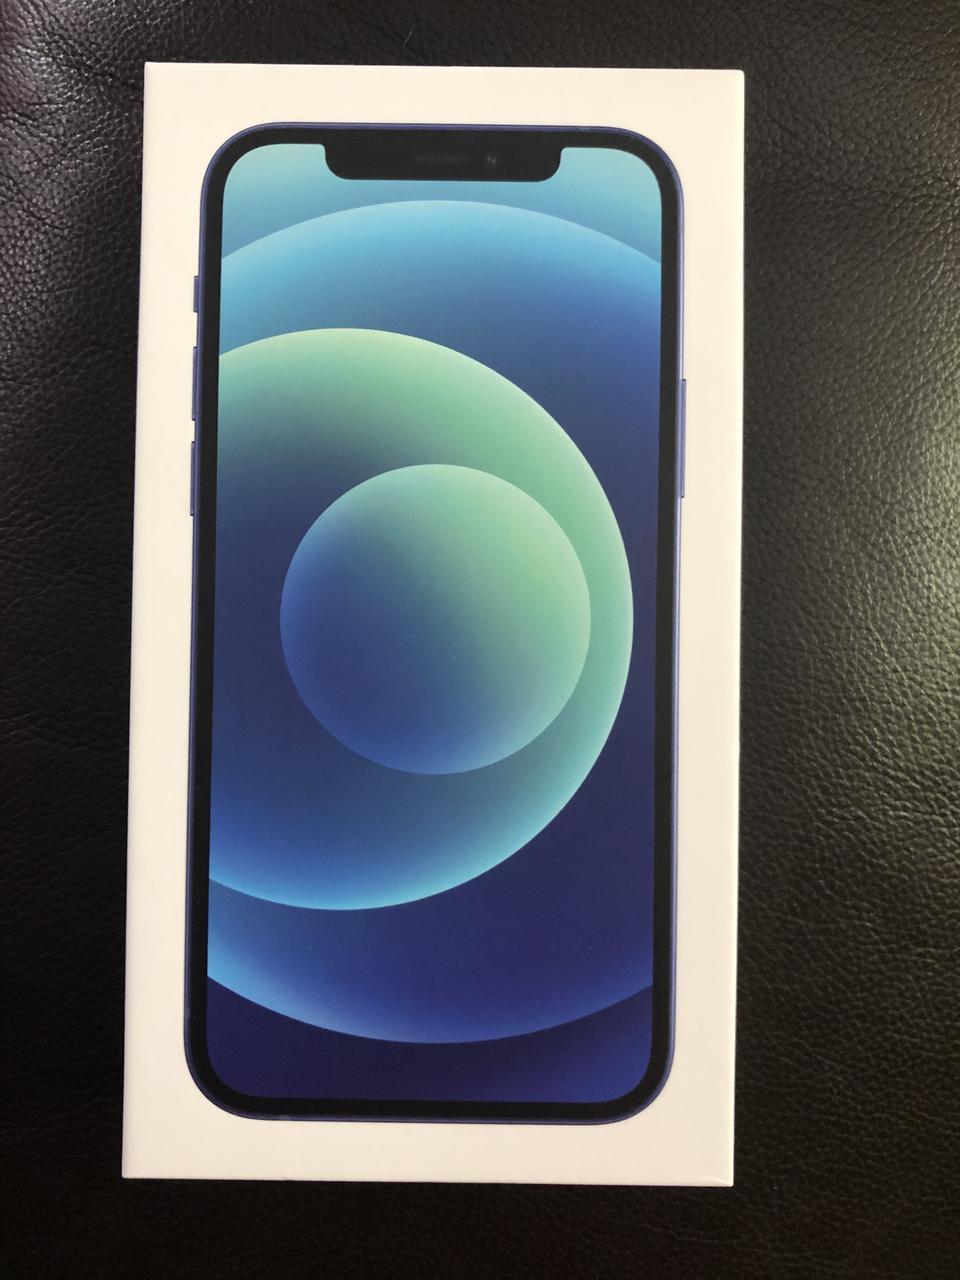 Iphone 12 256 gb สีน้ำเงิน แท้ ของใหม่  รูปที่ 1